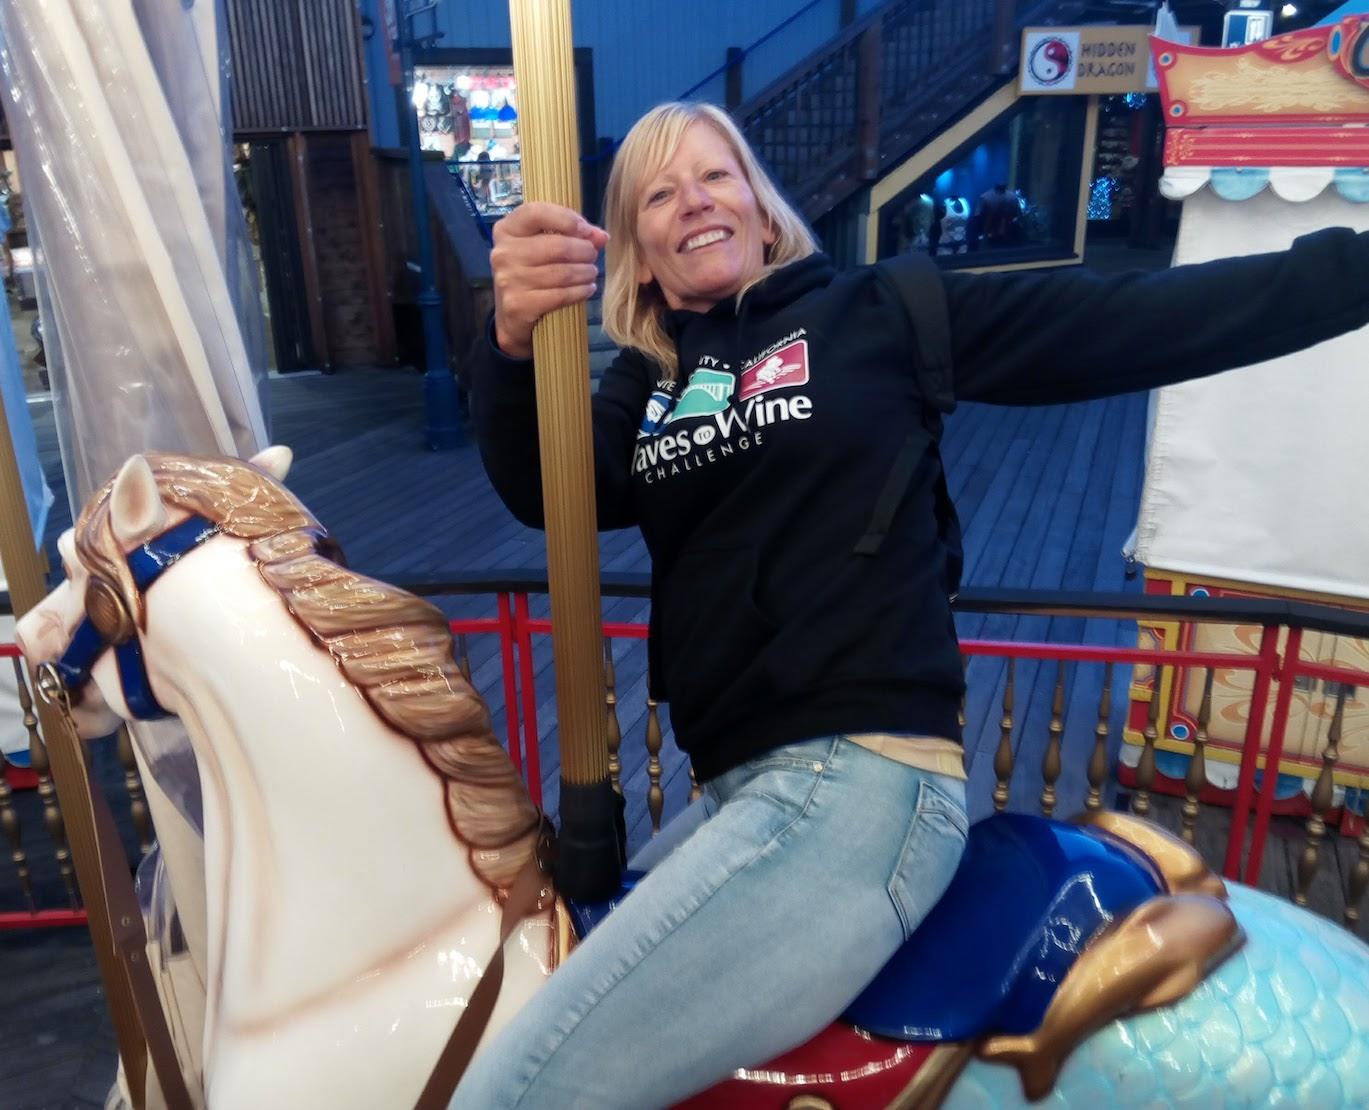 San Francisco Bay Area - Mogsy on the carousel